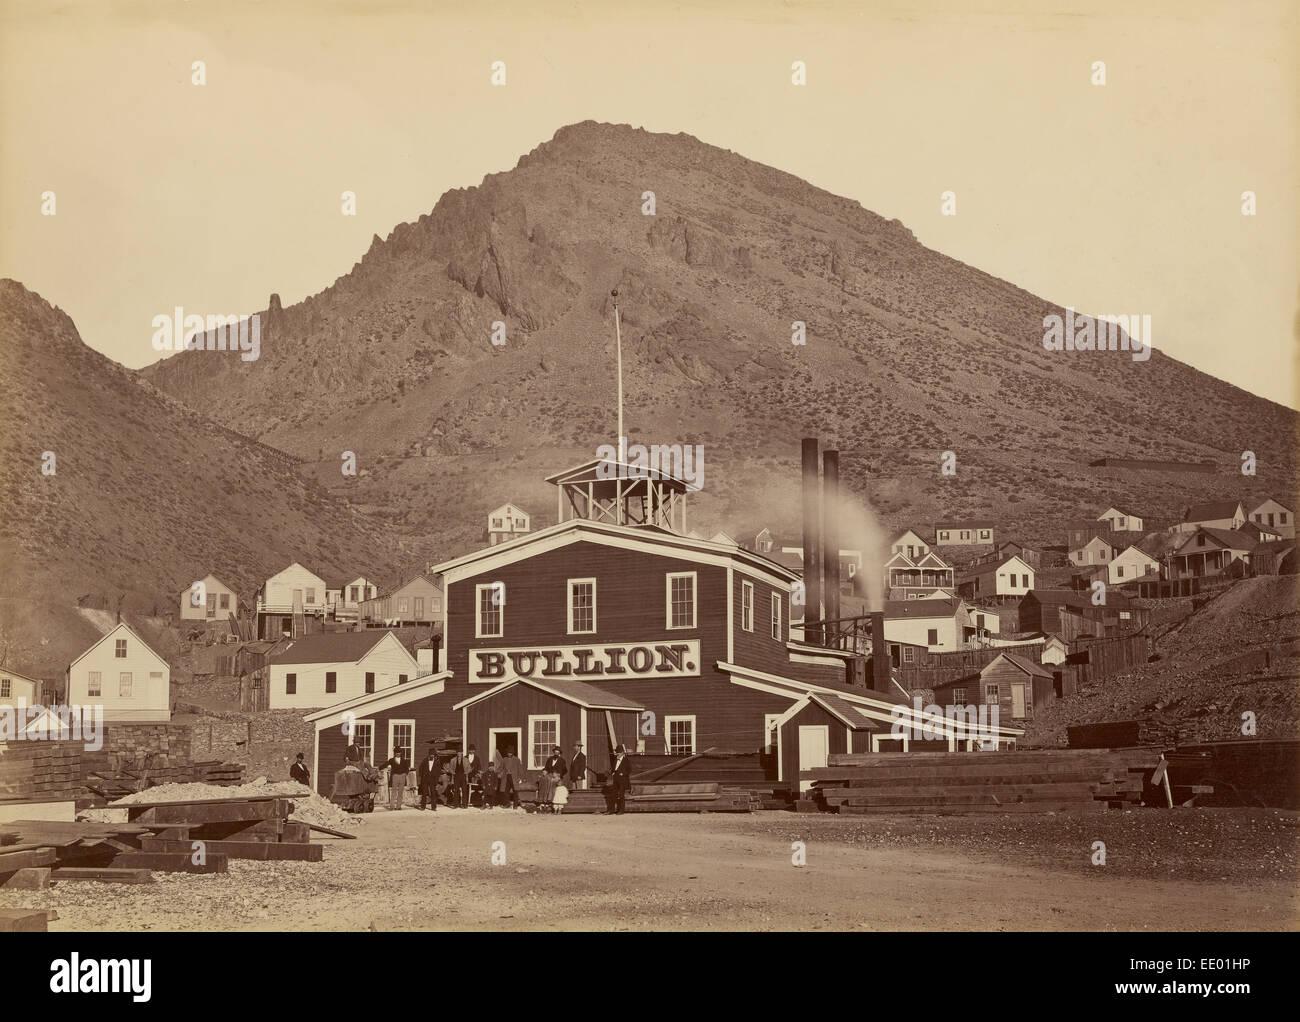 [The Bullion Mine, Virginia City, Nevada]; Carleton Watkins, American, 1829 - 1916; Virginia City, Nevada, United - Stock Image